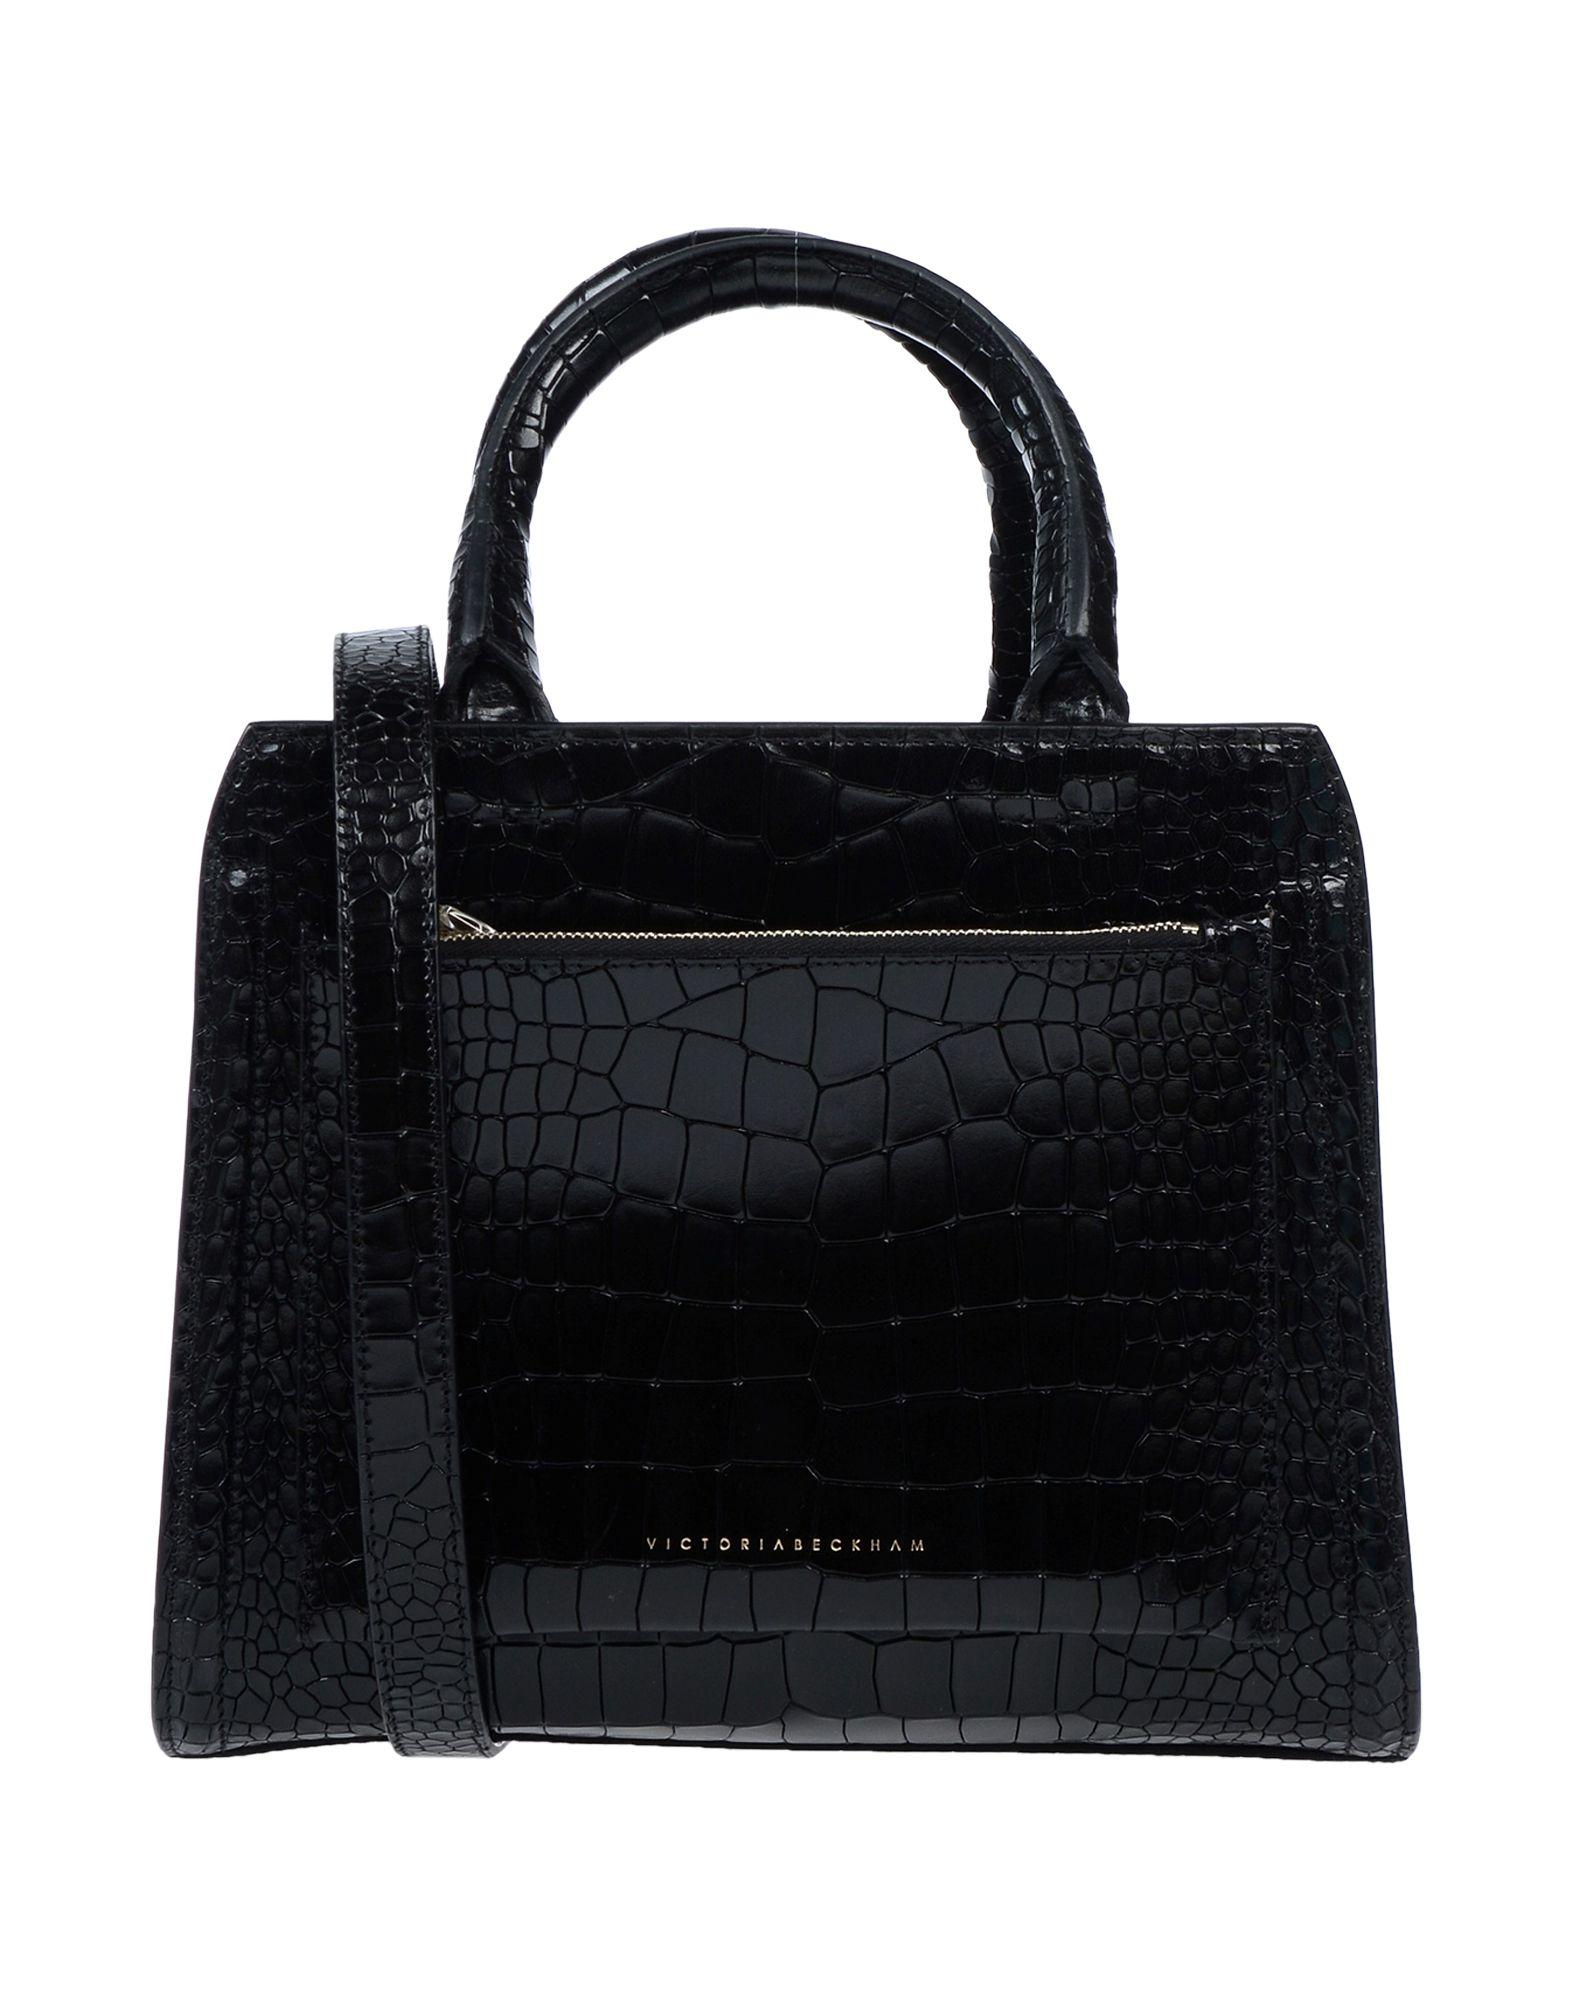 1c03b3788 Victoria Beckham Handbag - Women Victoria Beckham Handbags online on YOOX  Poland - 45443958GR